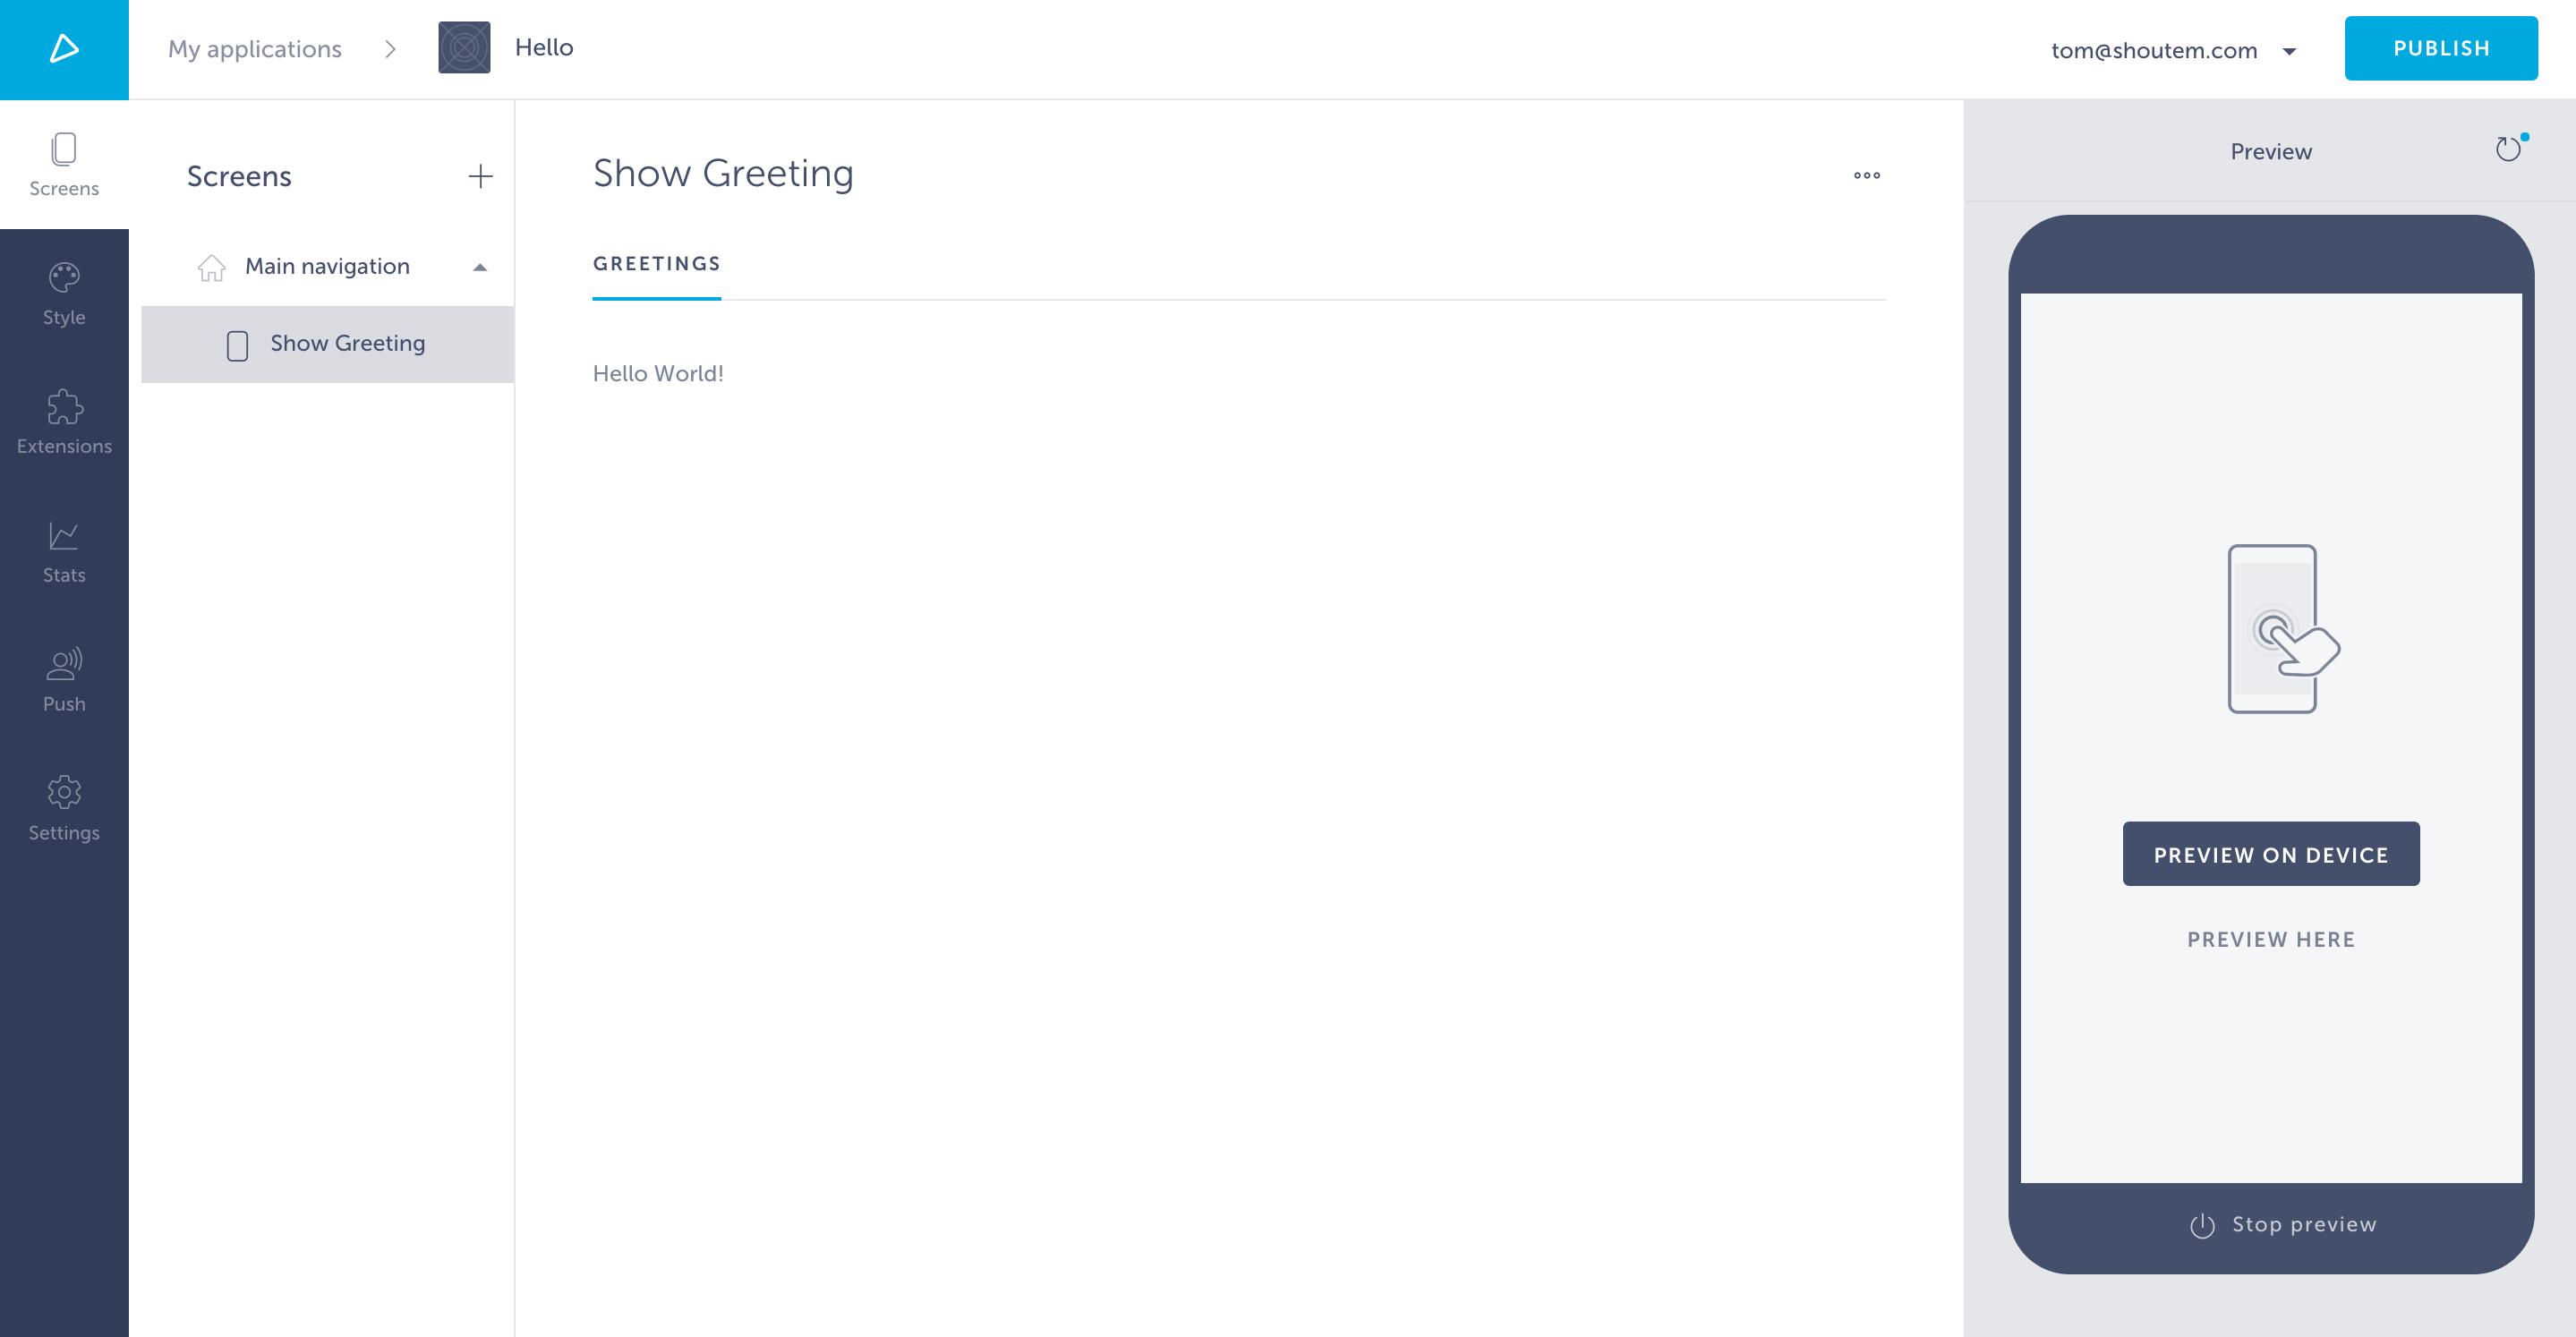 Hello World settings page